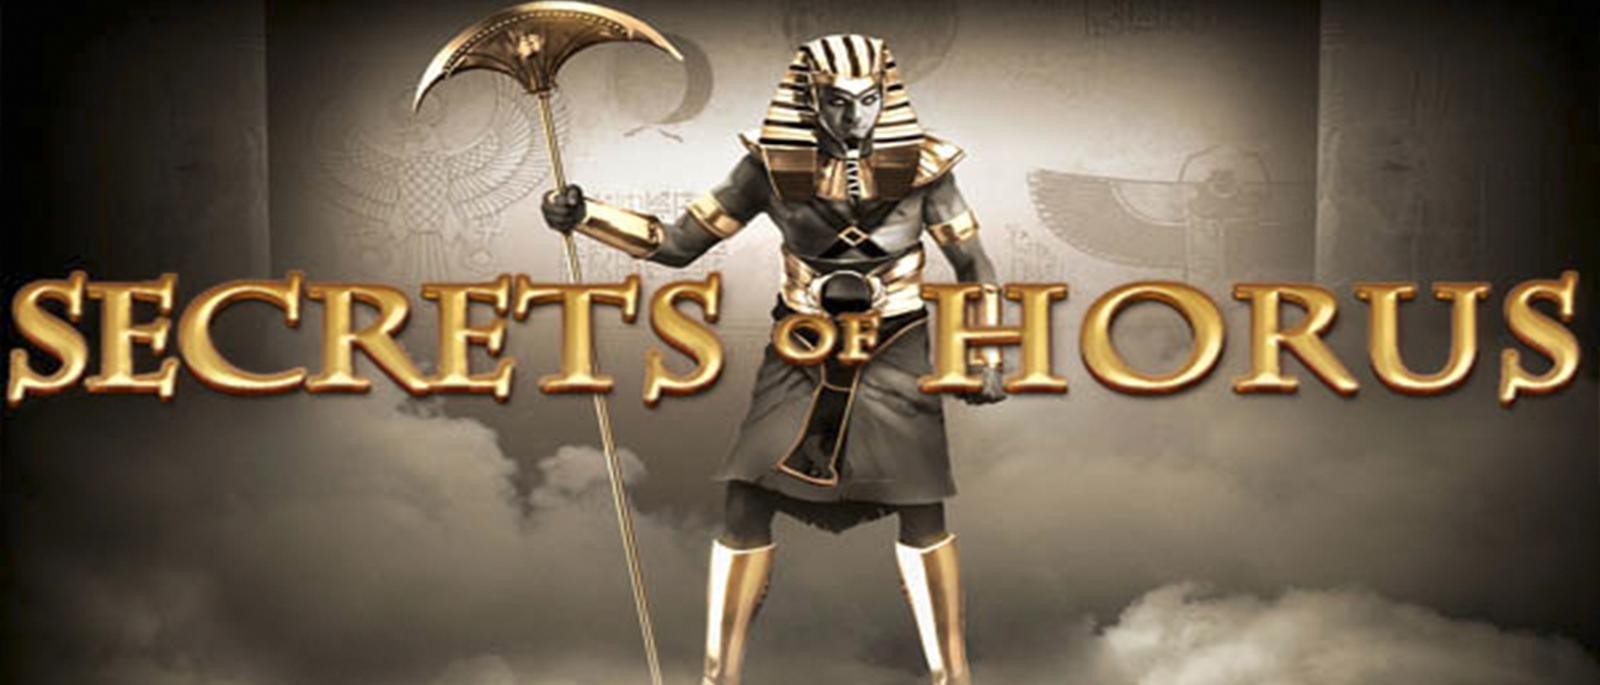 Secrets of horus Netent Slot Spiel